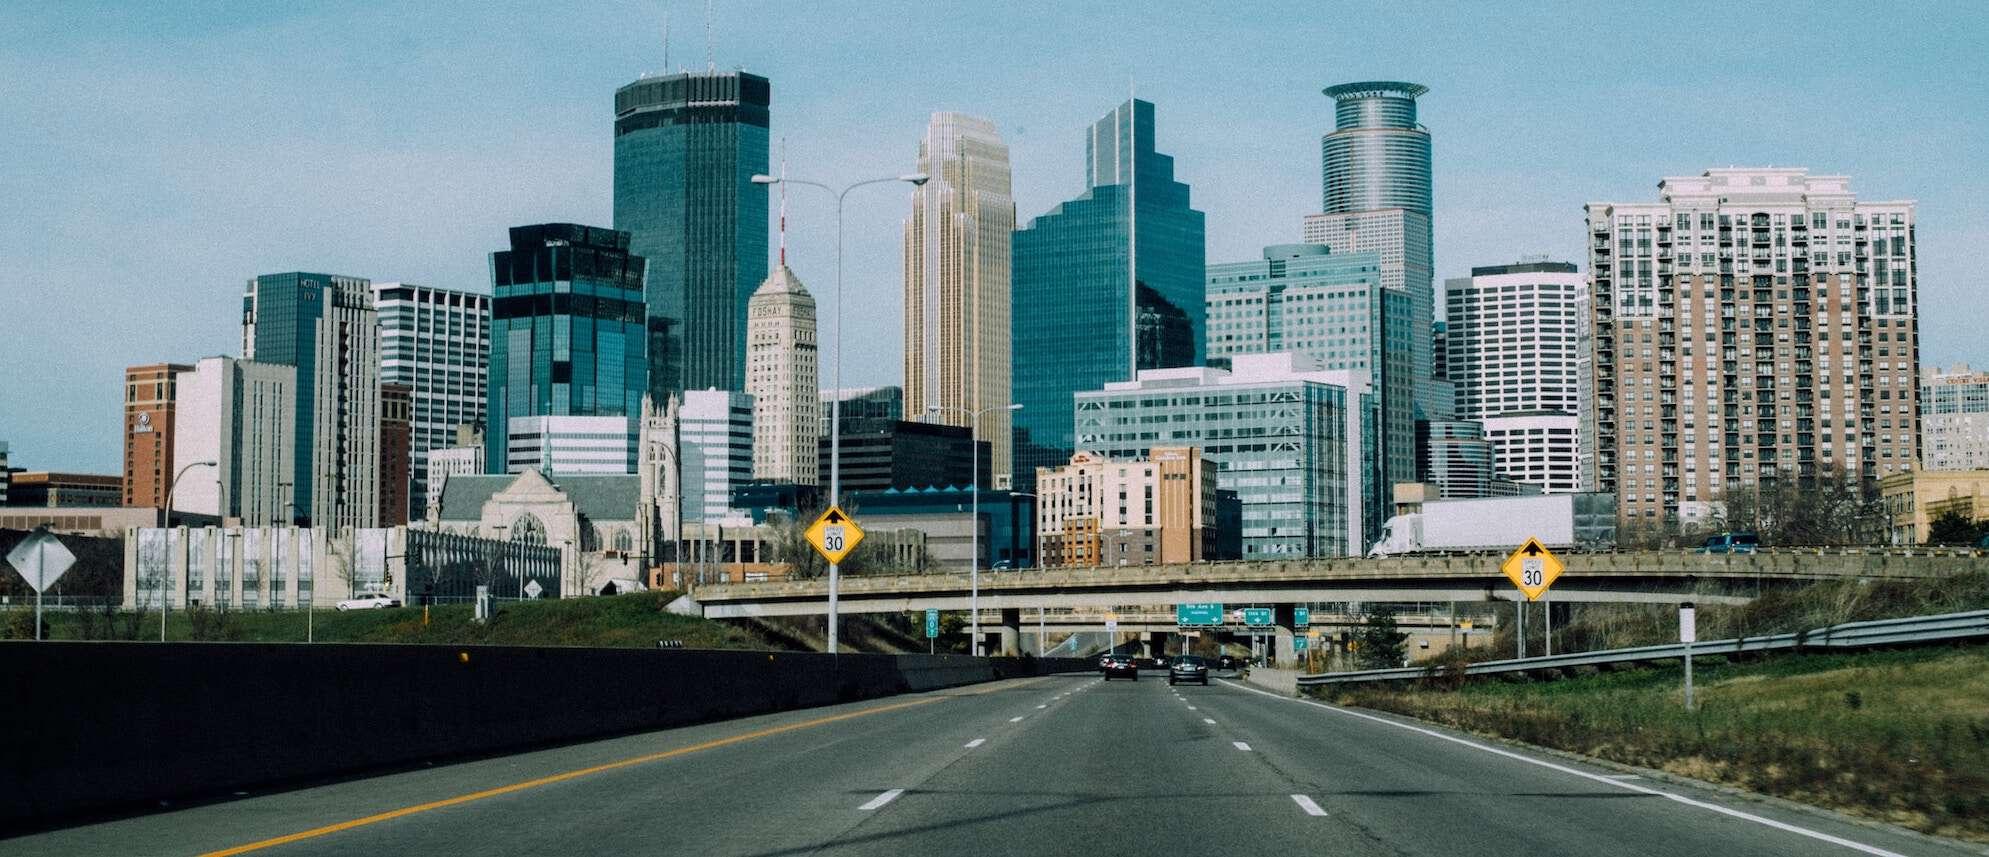 Minneapolis SEO Agency, Minneapolis SEO Company, Minneapolis SEO For Small Business 2020, Acme Web Agency